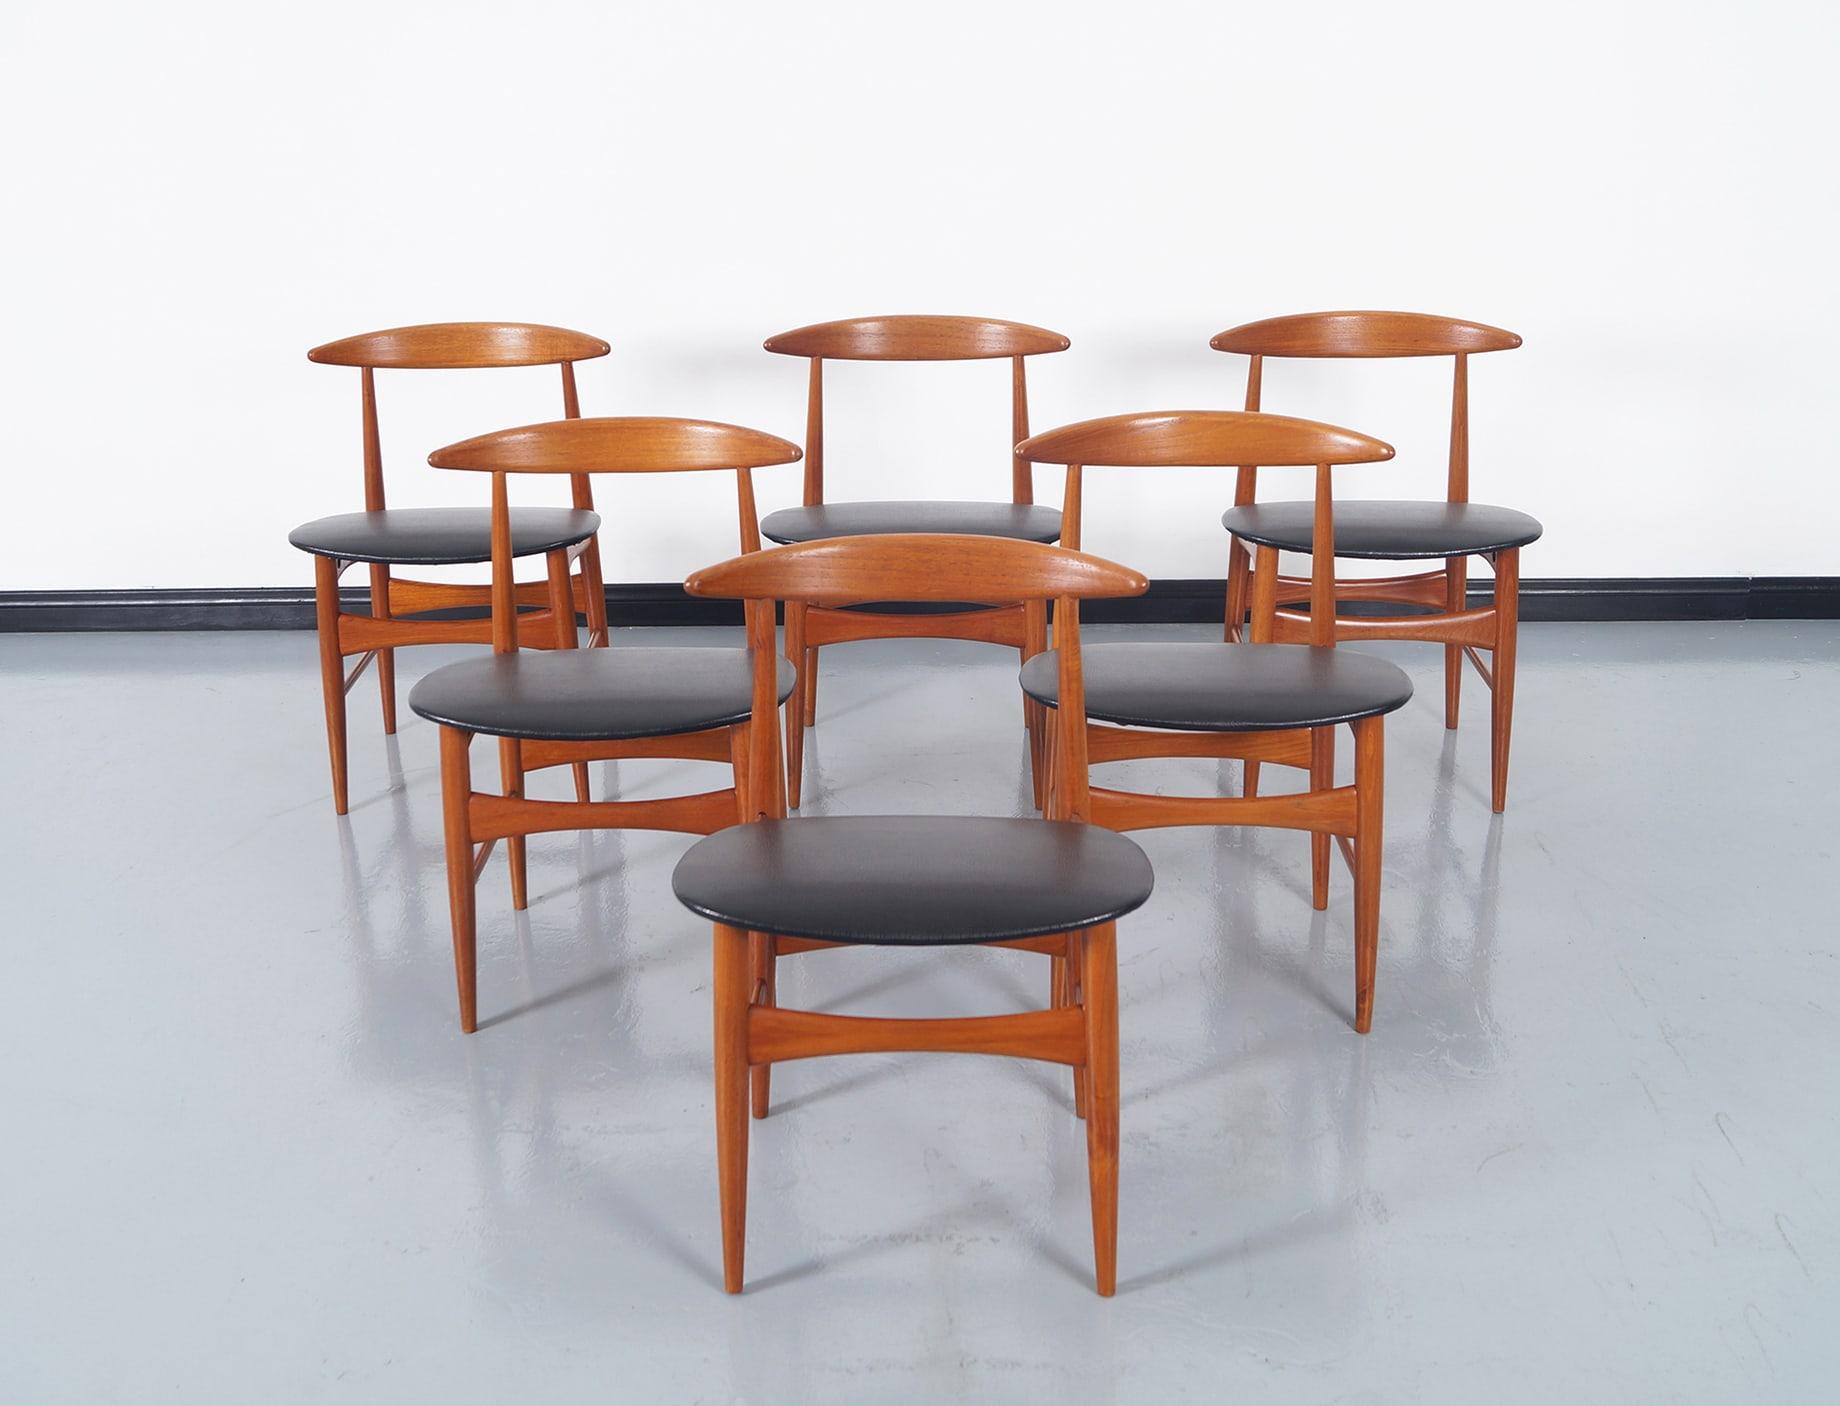 Danish Teak Dining Chairs by Mogens Kold